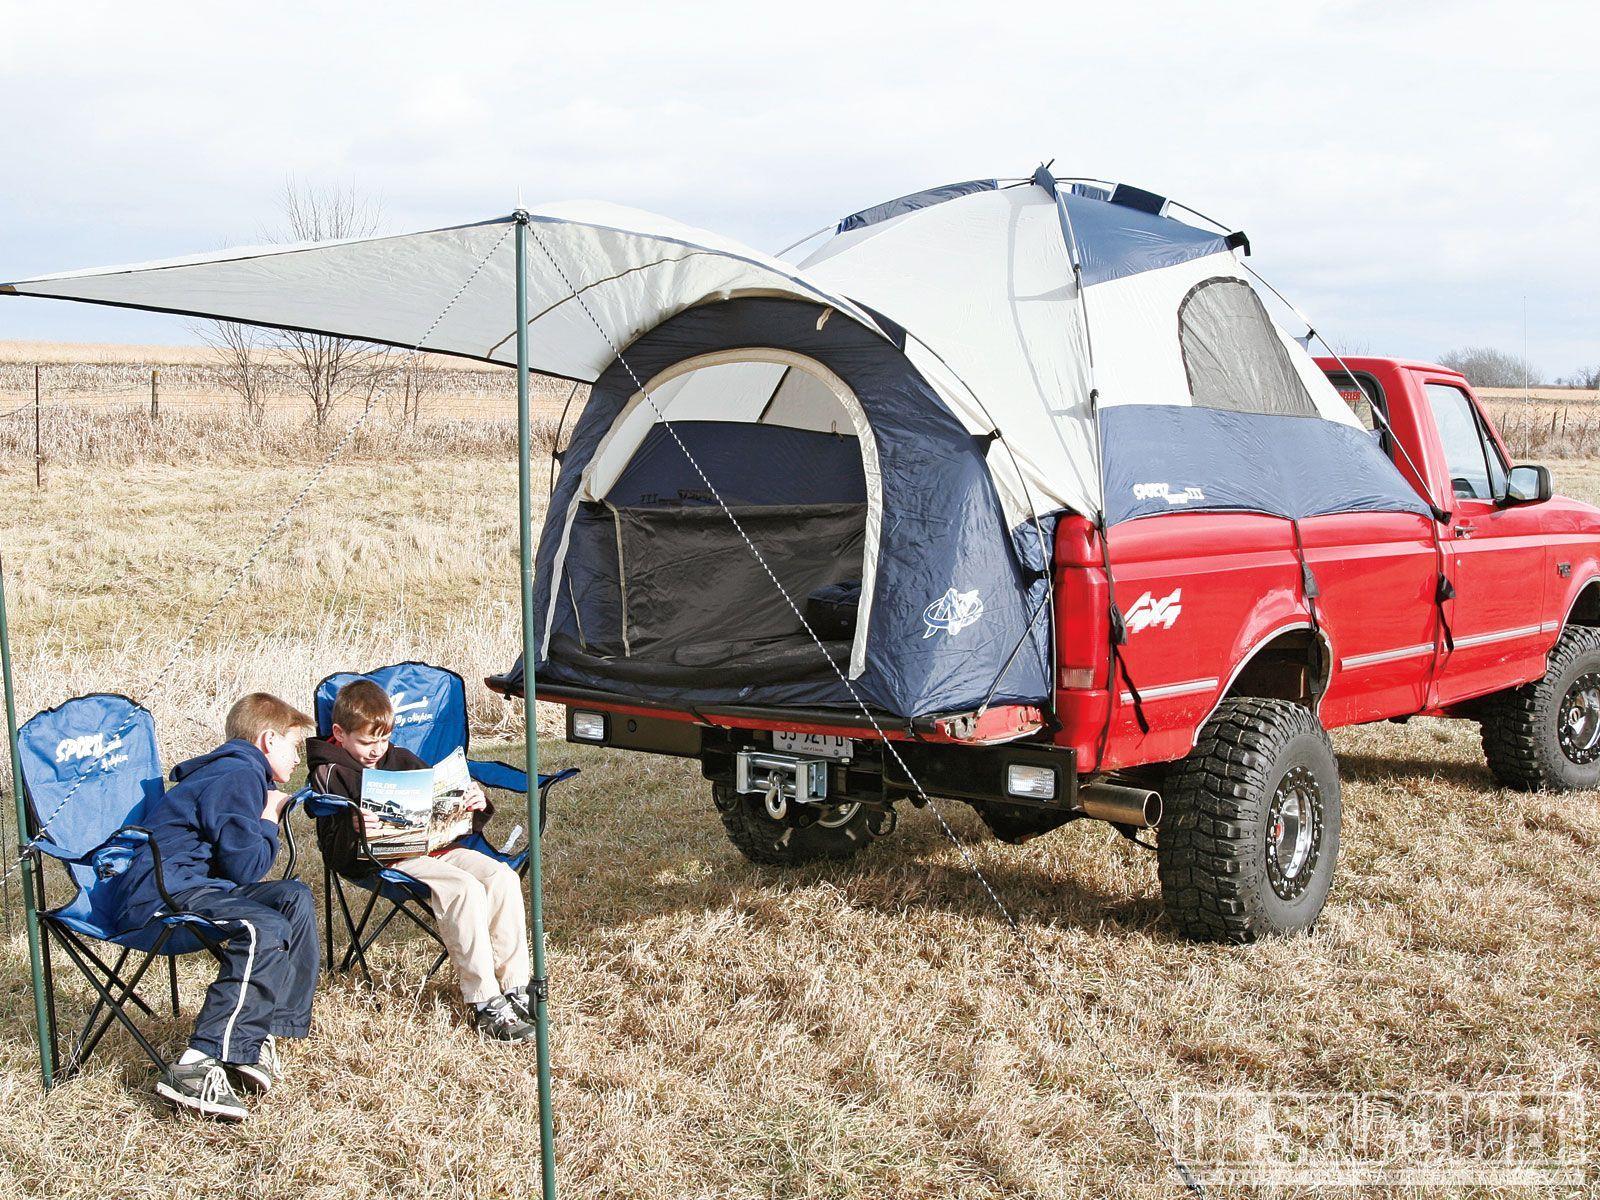 ford truck tent - Google Search More & ford truck tent - Google Search u2026   Pinteresu2026